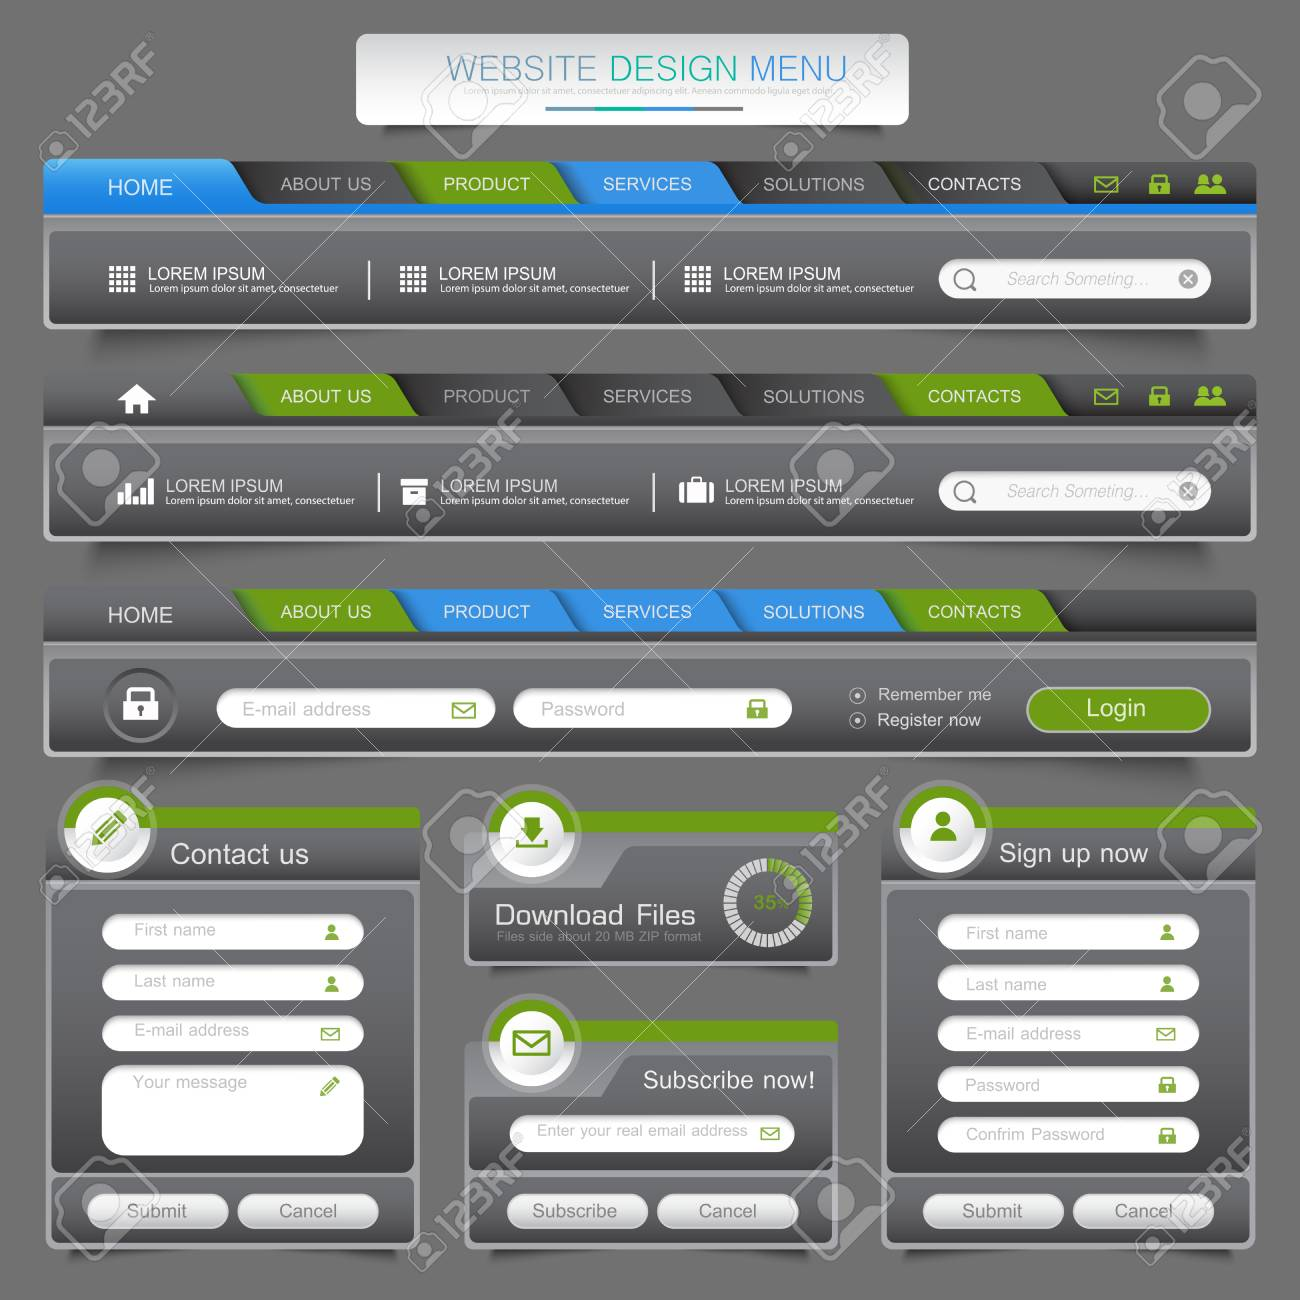 Design Menu Navigation Elements With Icons Set: Navigation Menu ...